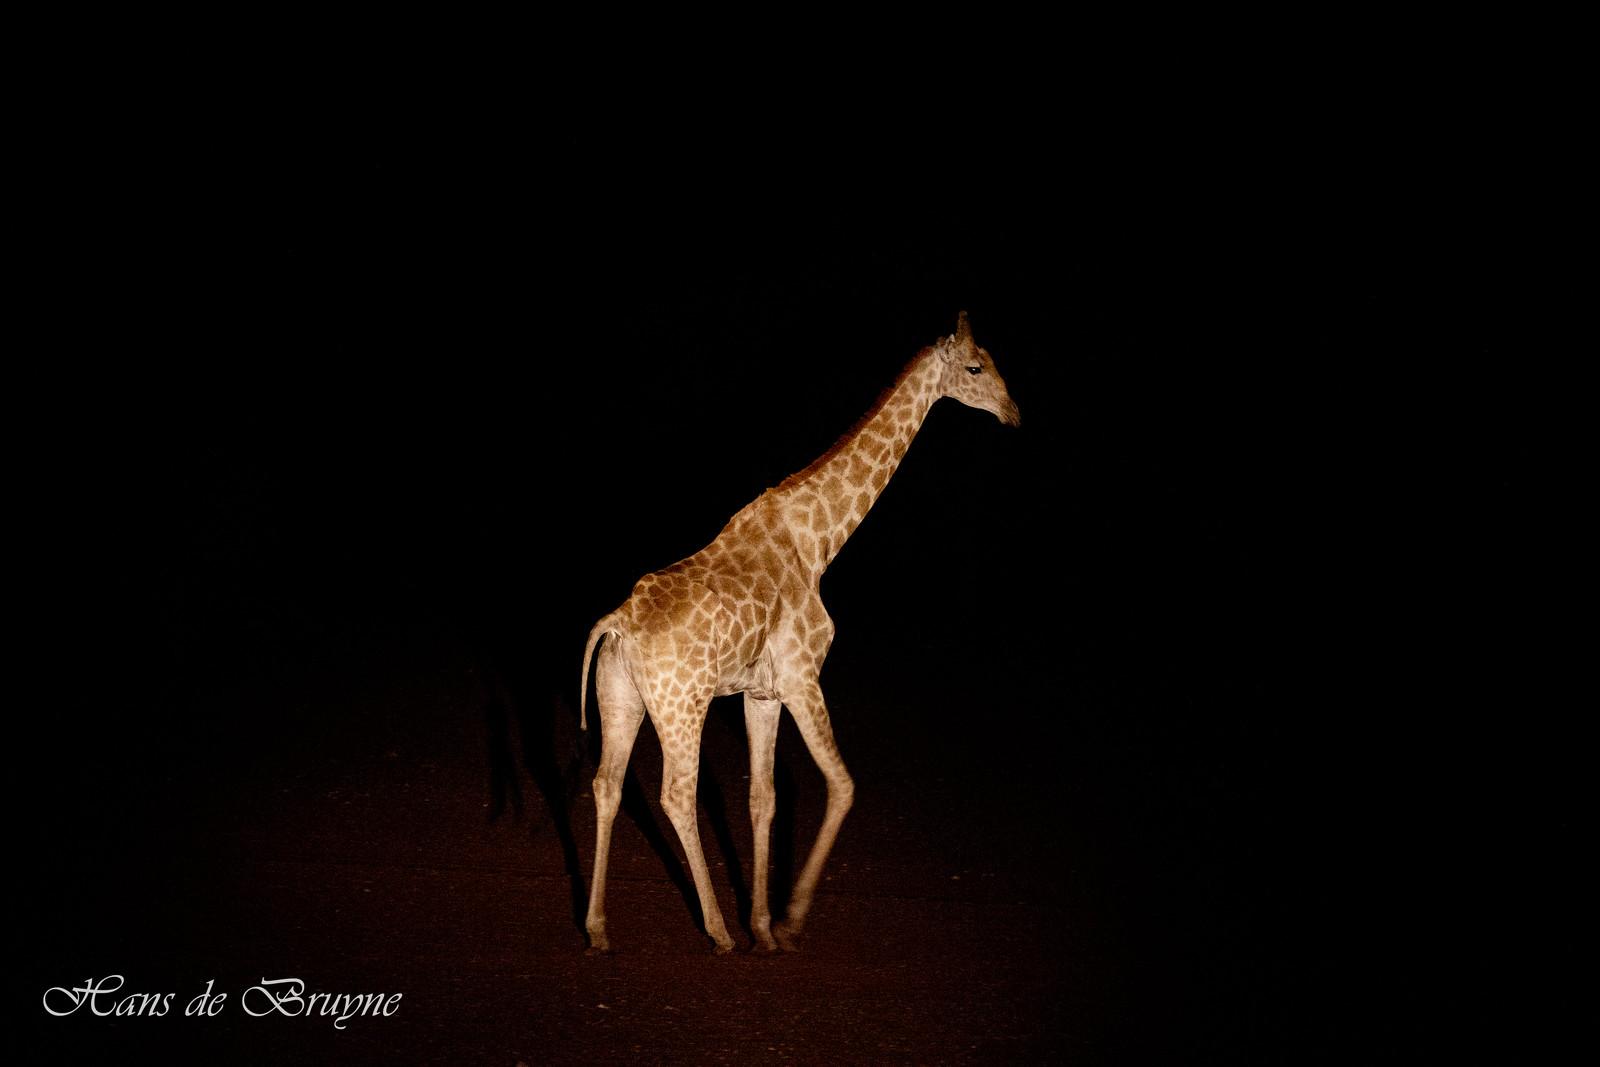 Giraffe at night